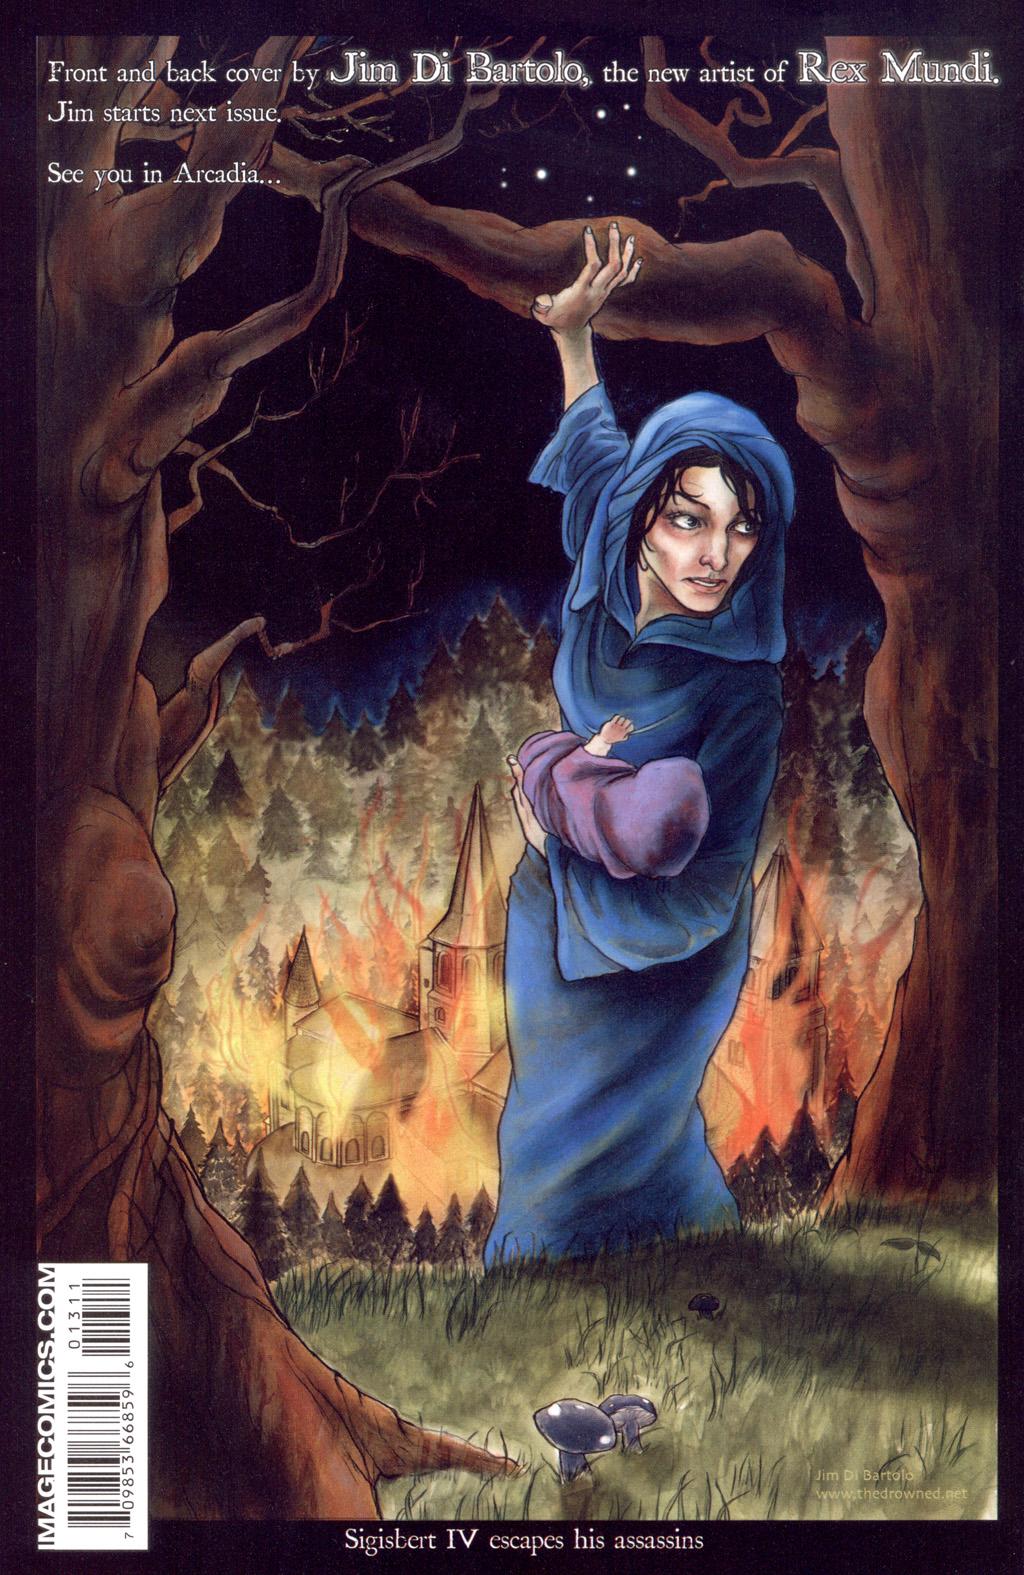 Read online Rex Mundi comic -  Issue #13 - 31